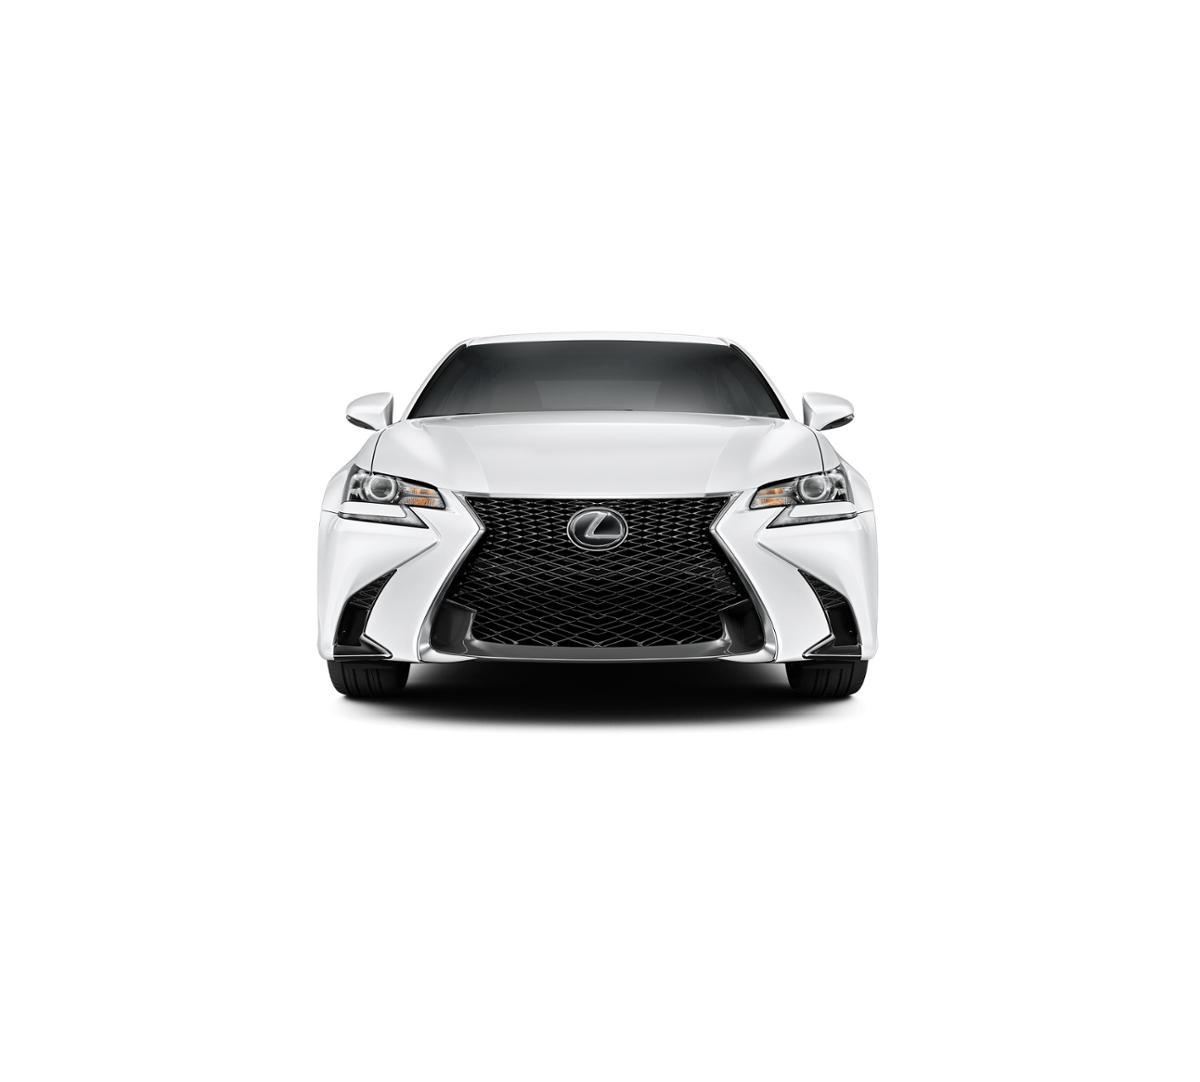 Lexus Gs Lease: New Ultra White 2019 Lexus GS 350 F SPORT For Sale Fremont